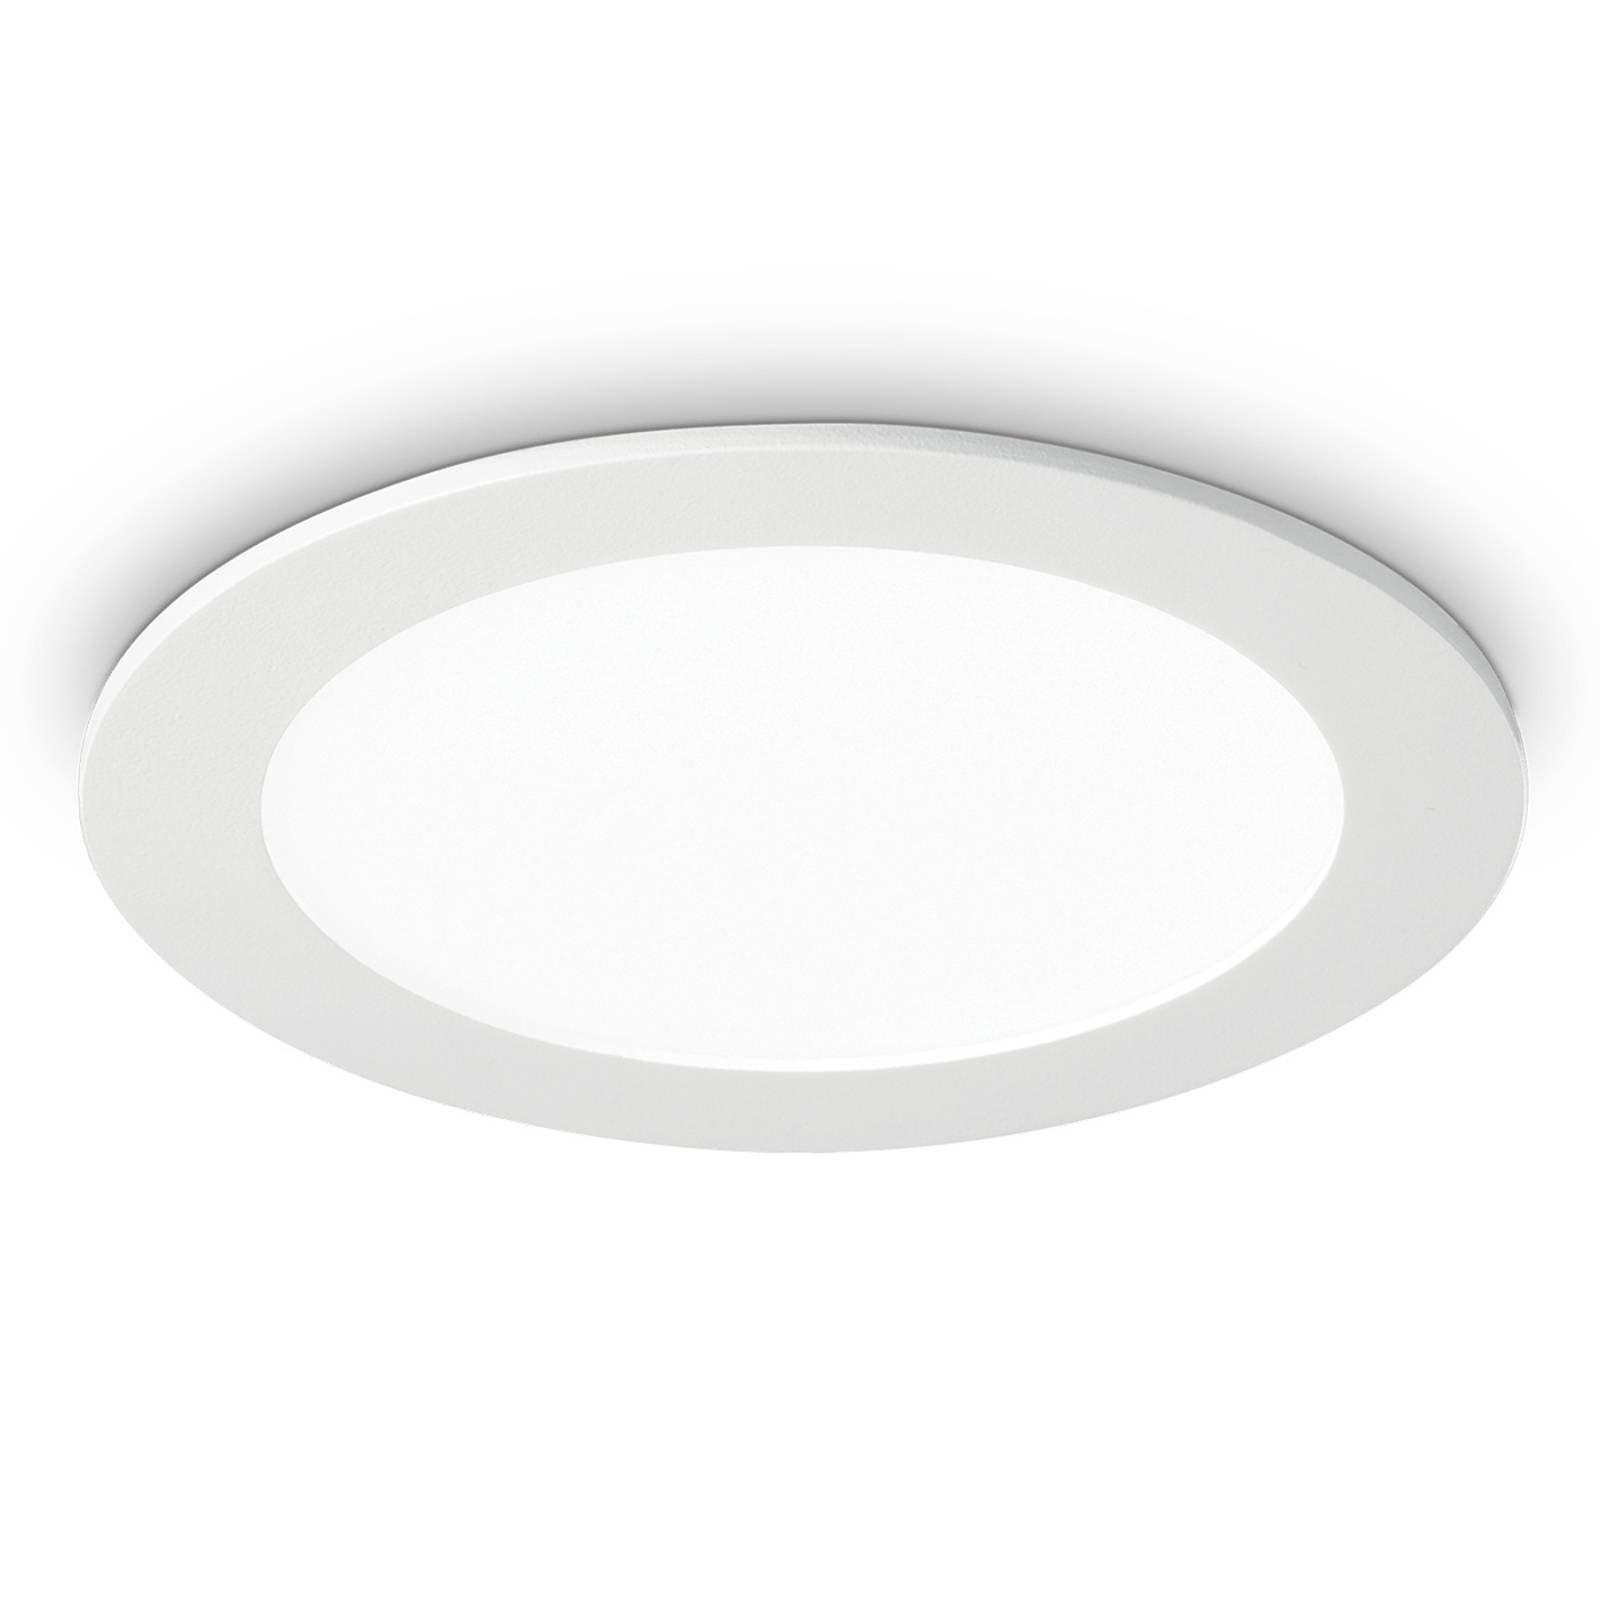 LED-taklampe Groove round, 3 000 K, 22,7 cm